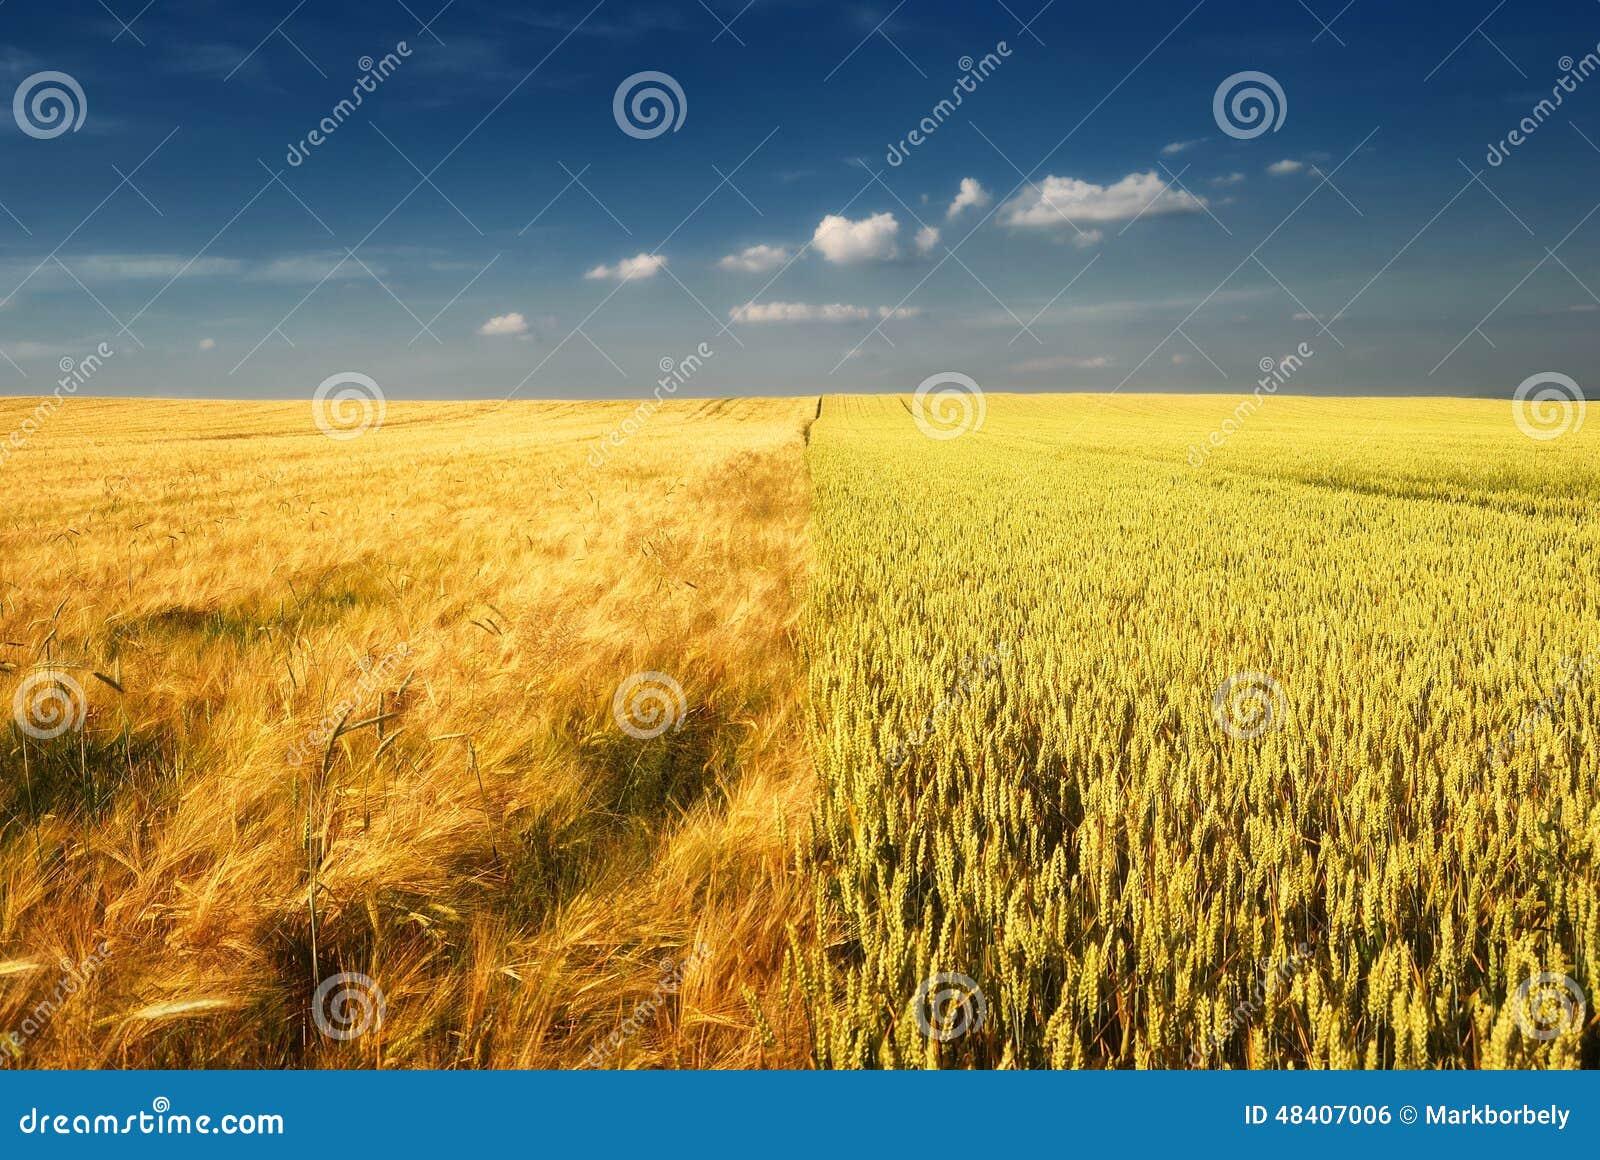 Campo di frumento dorato e cielo nuvoloso